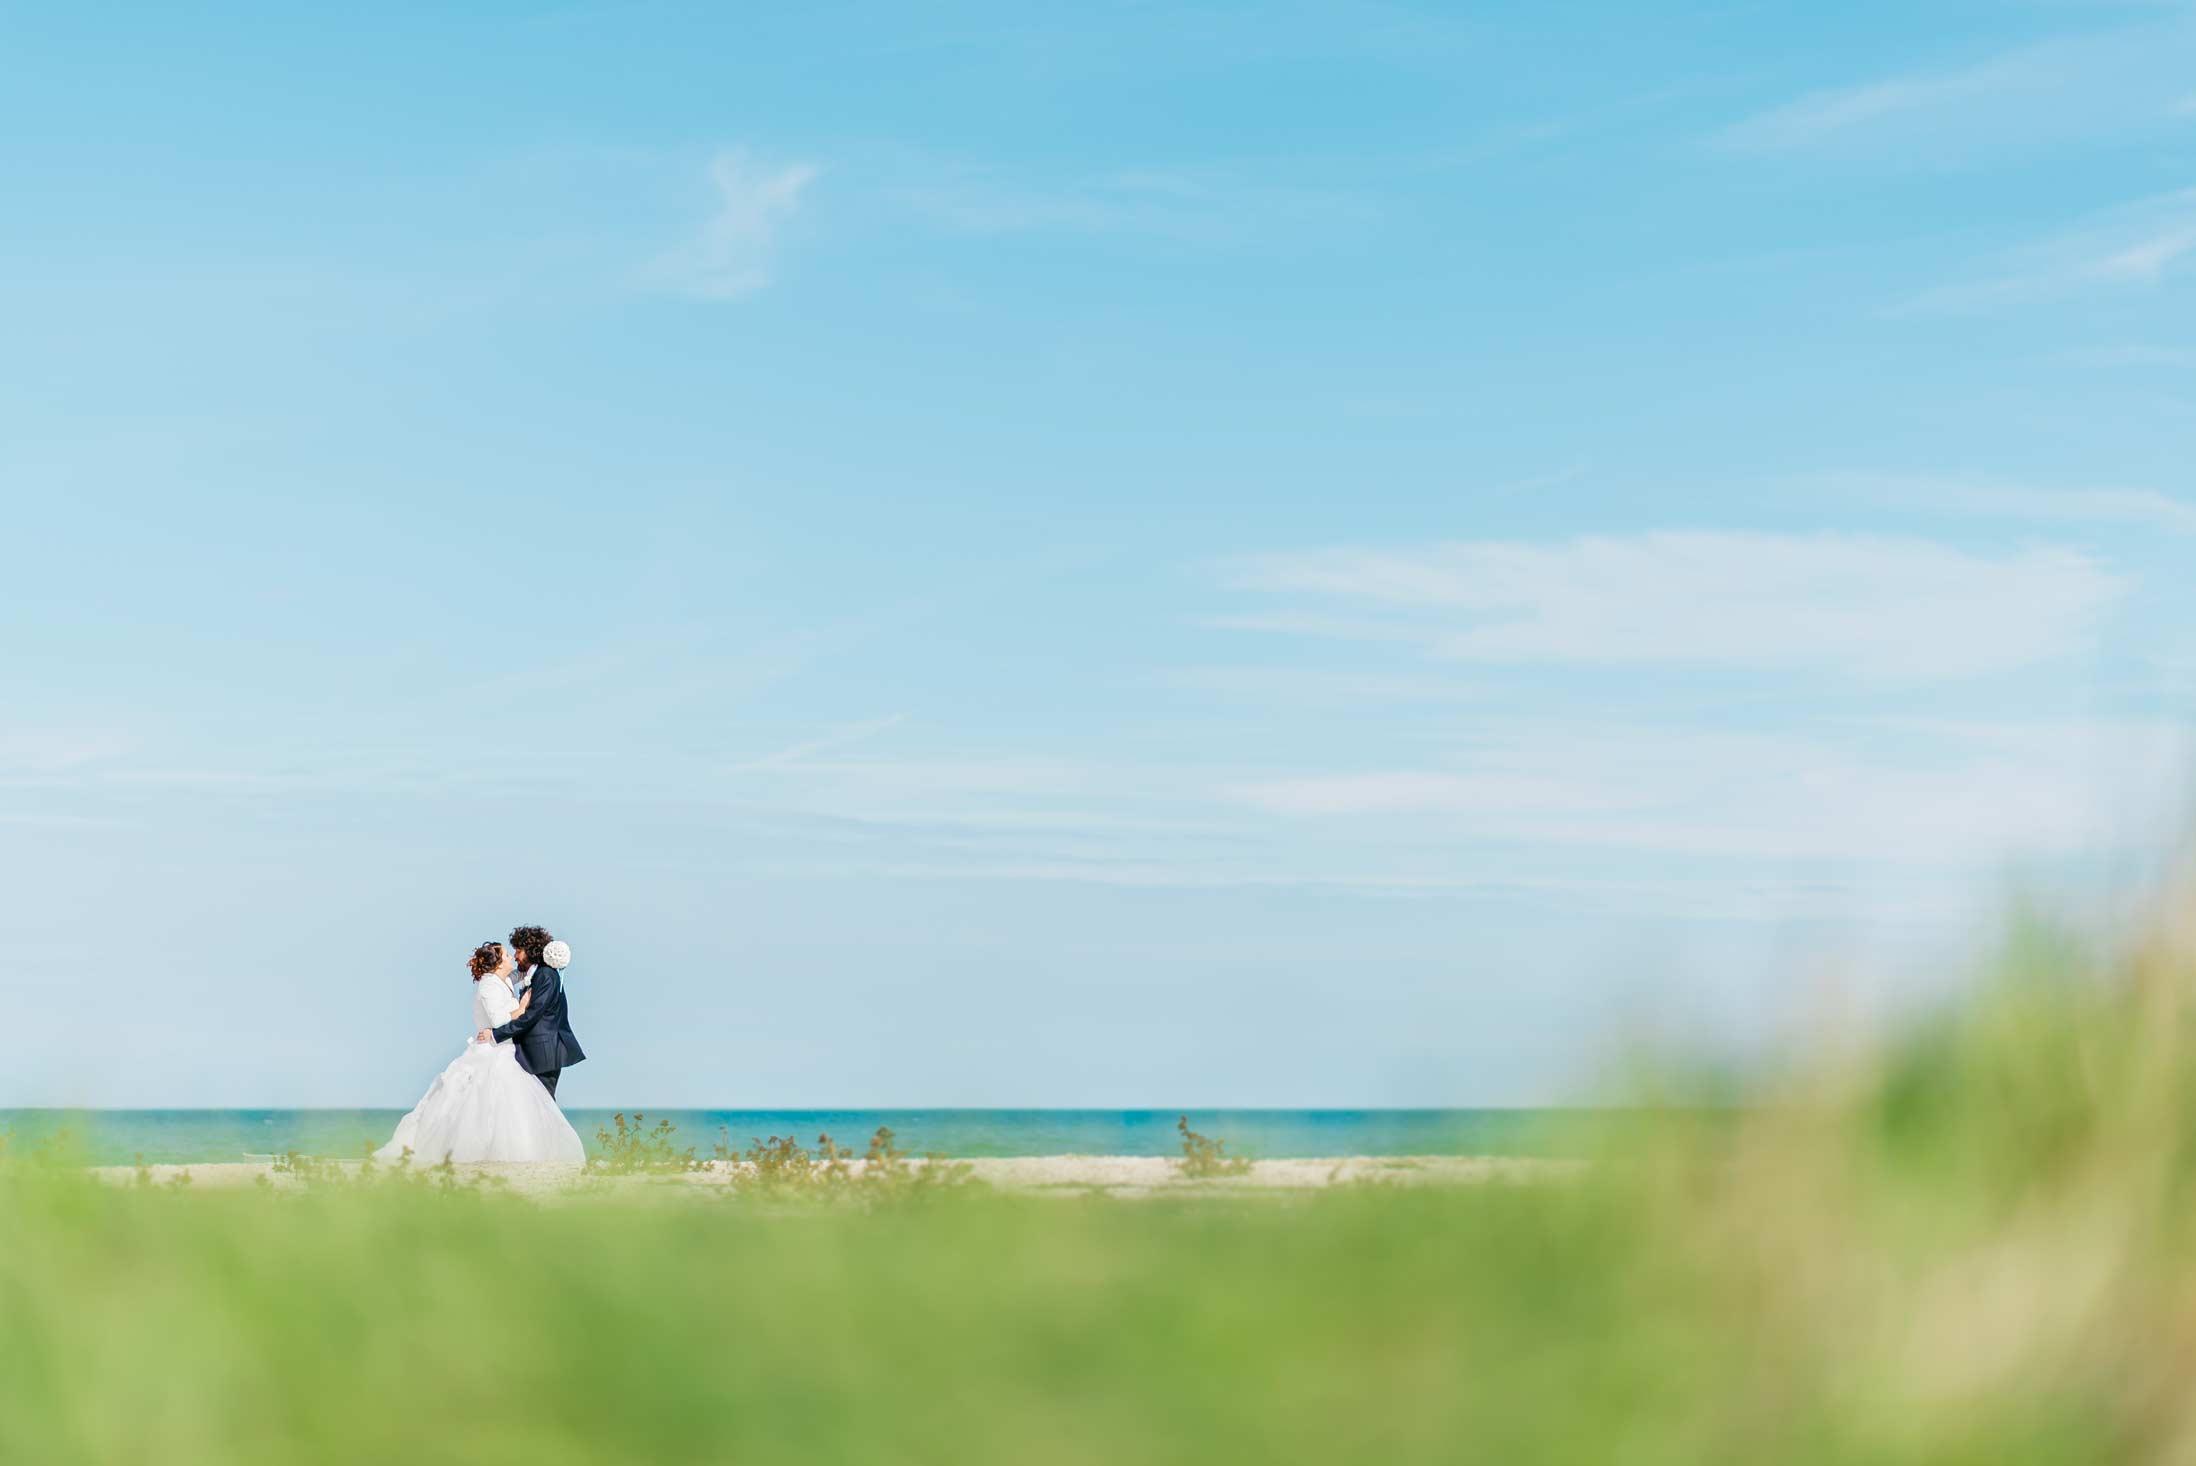 Wedding-Photographer-in-Italy-Portraits